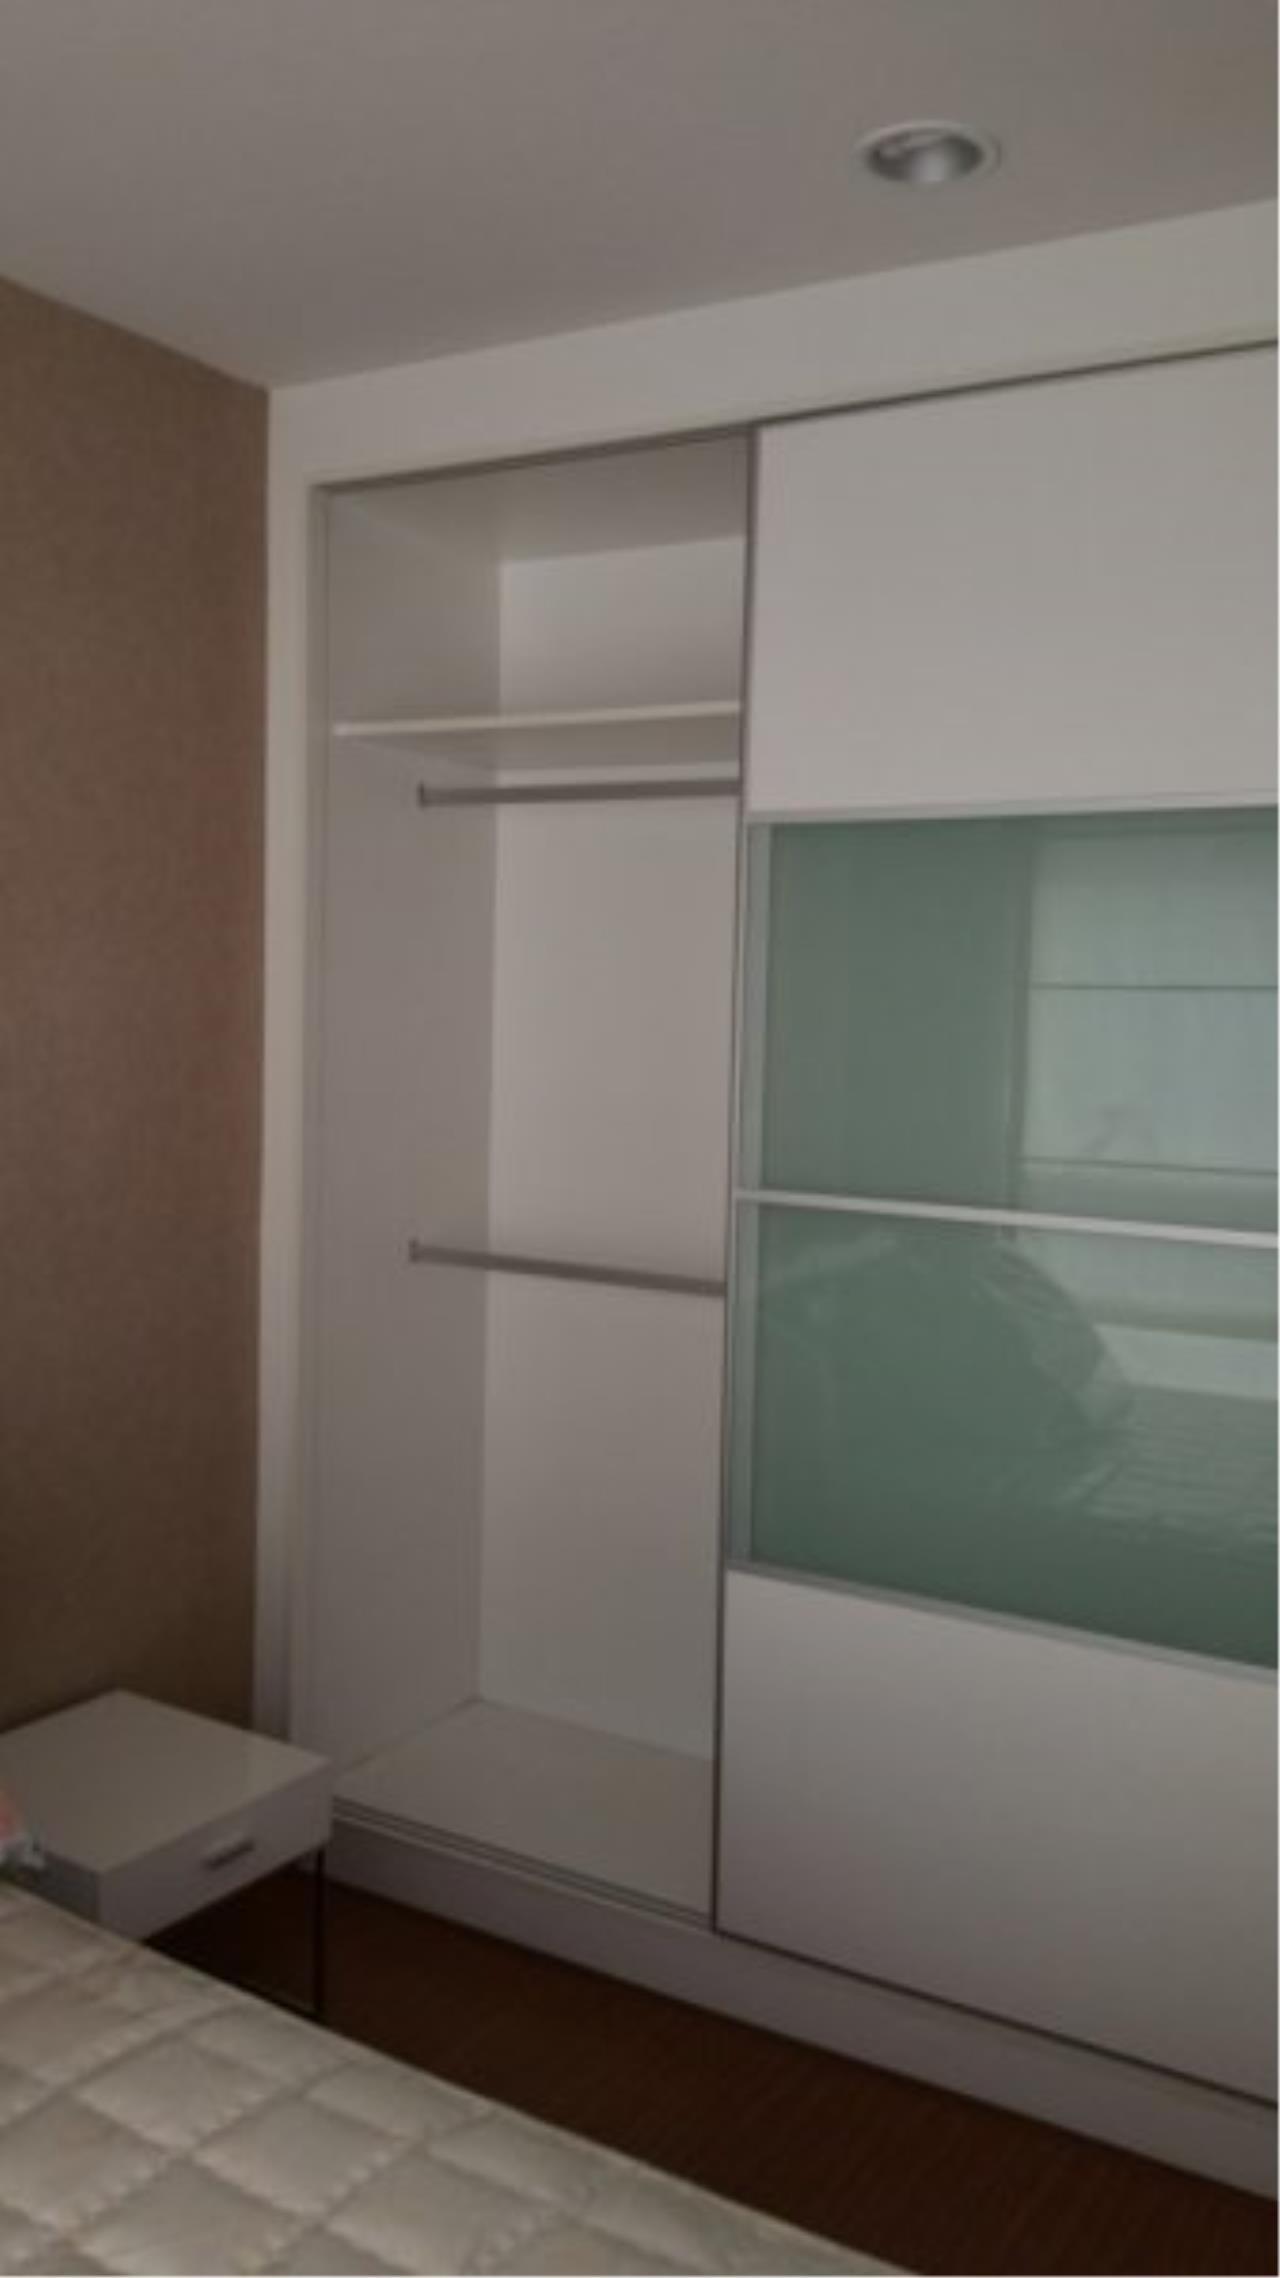 Piri Property Agency's Cozy 1 Bedroom in the Diamond Sukhumvit Condo for sale on high floor 2